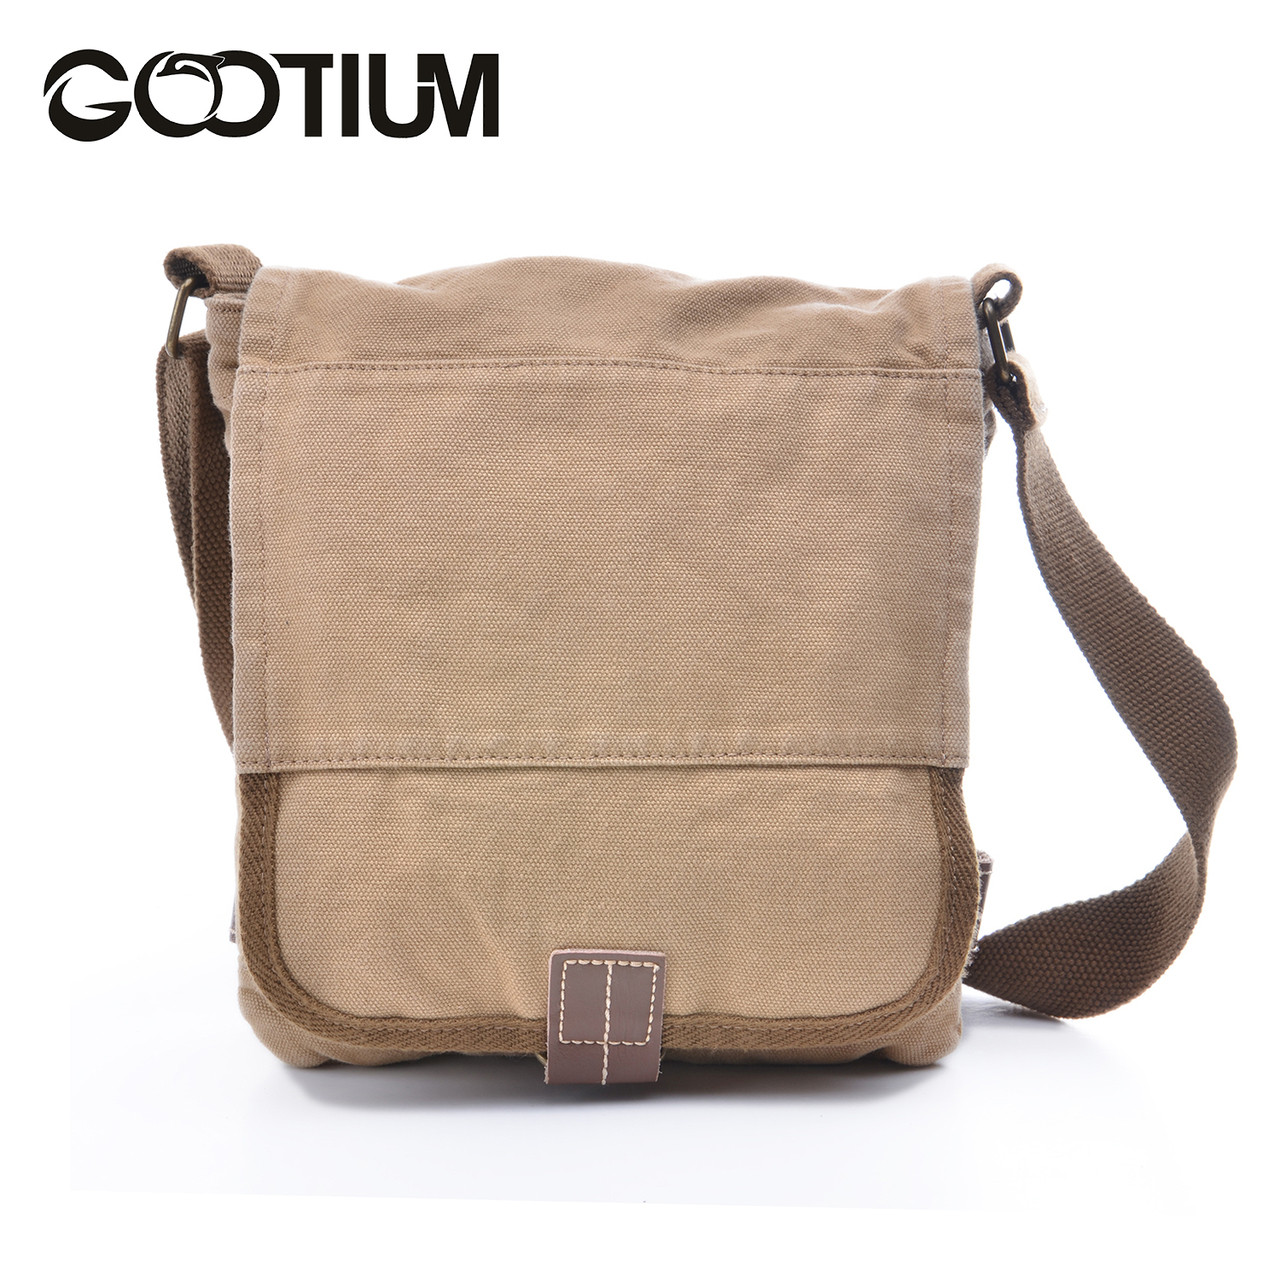 cca81ce7f Gootium 21223KA Cotton Canvas Cross Body Small Messenger Bag Shoulder  Handbag,Khaki